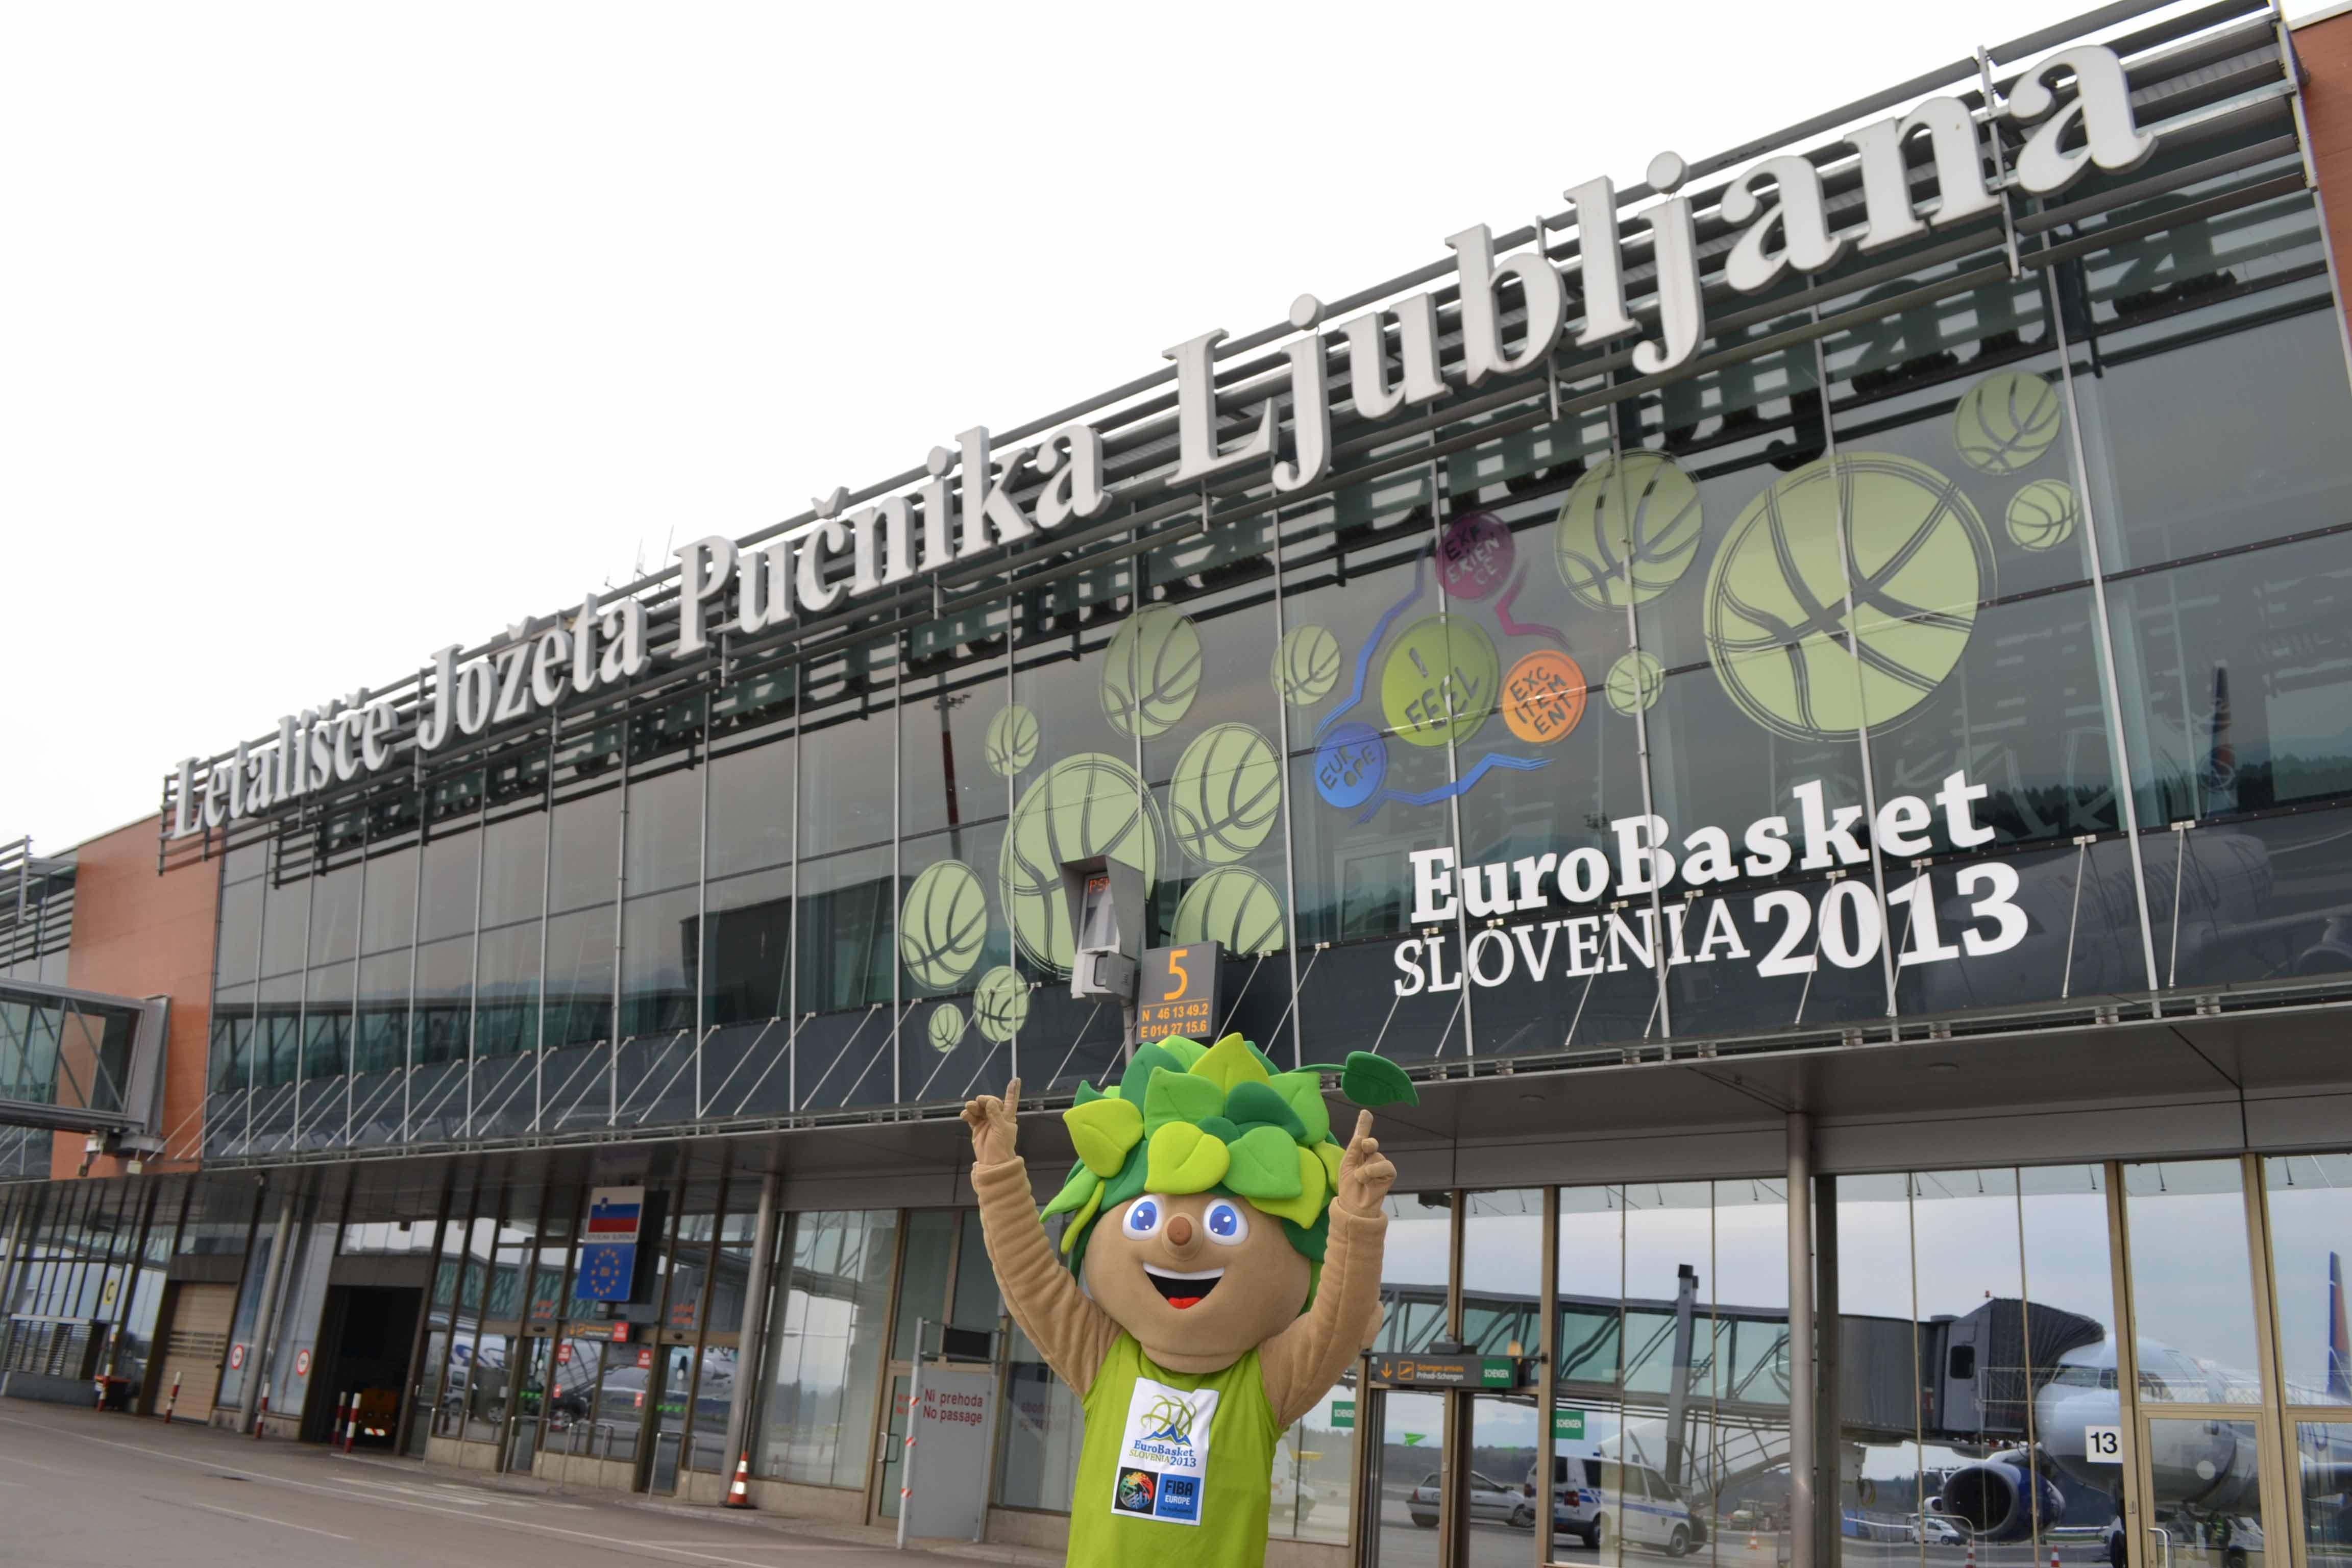 EuroBasket 2013 begins in Slovenia